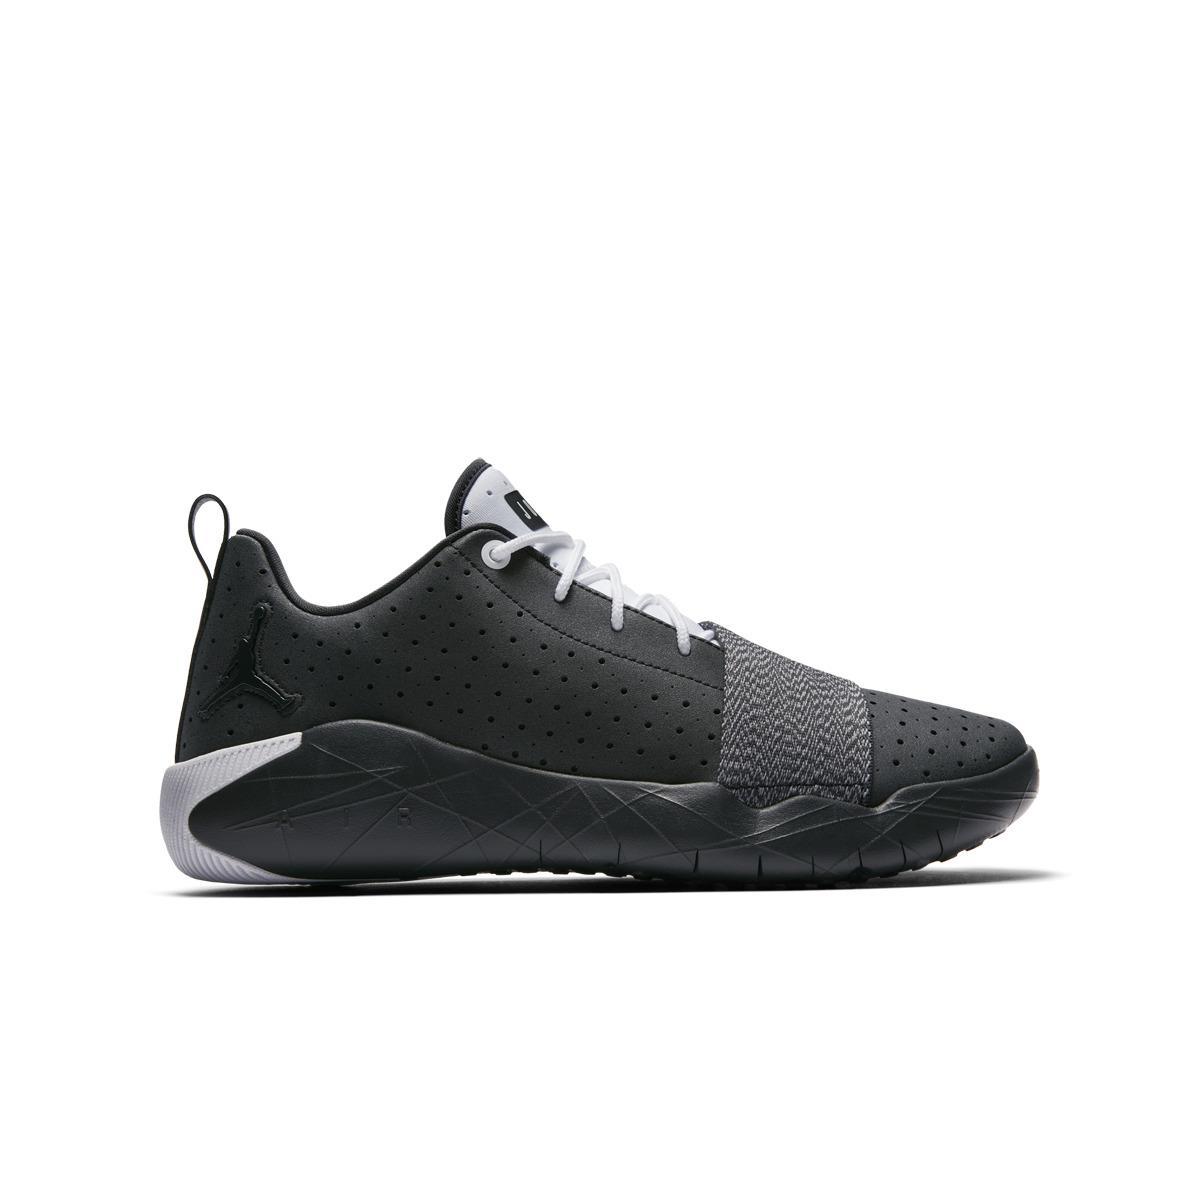 3e5306b00efb Lyst - Nike Jordan 23 Breakout Casual Trainers in Gray for Men